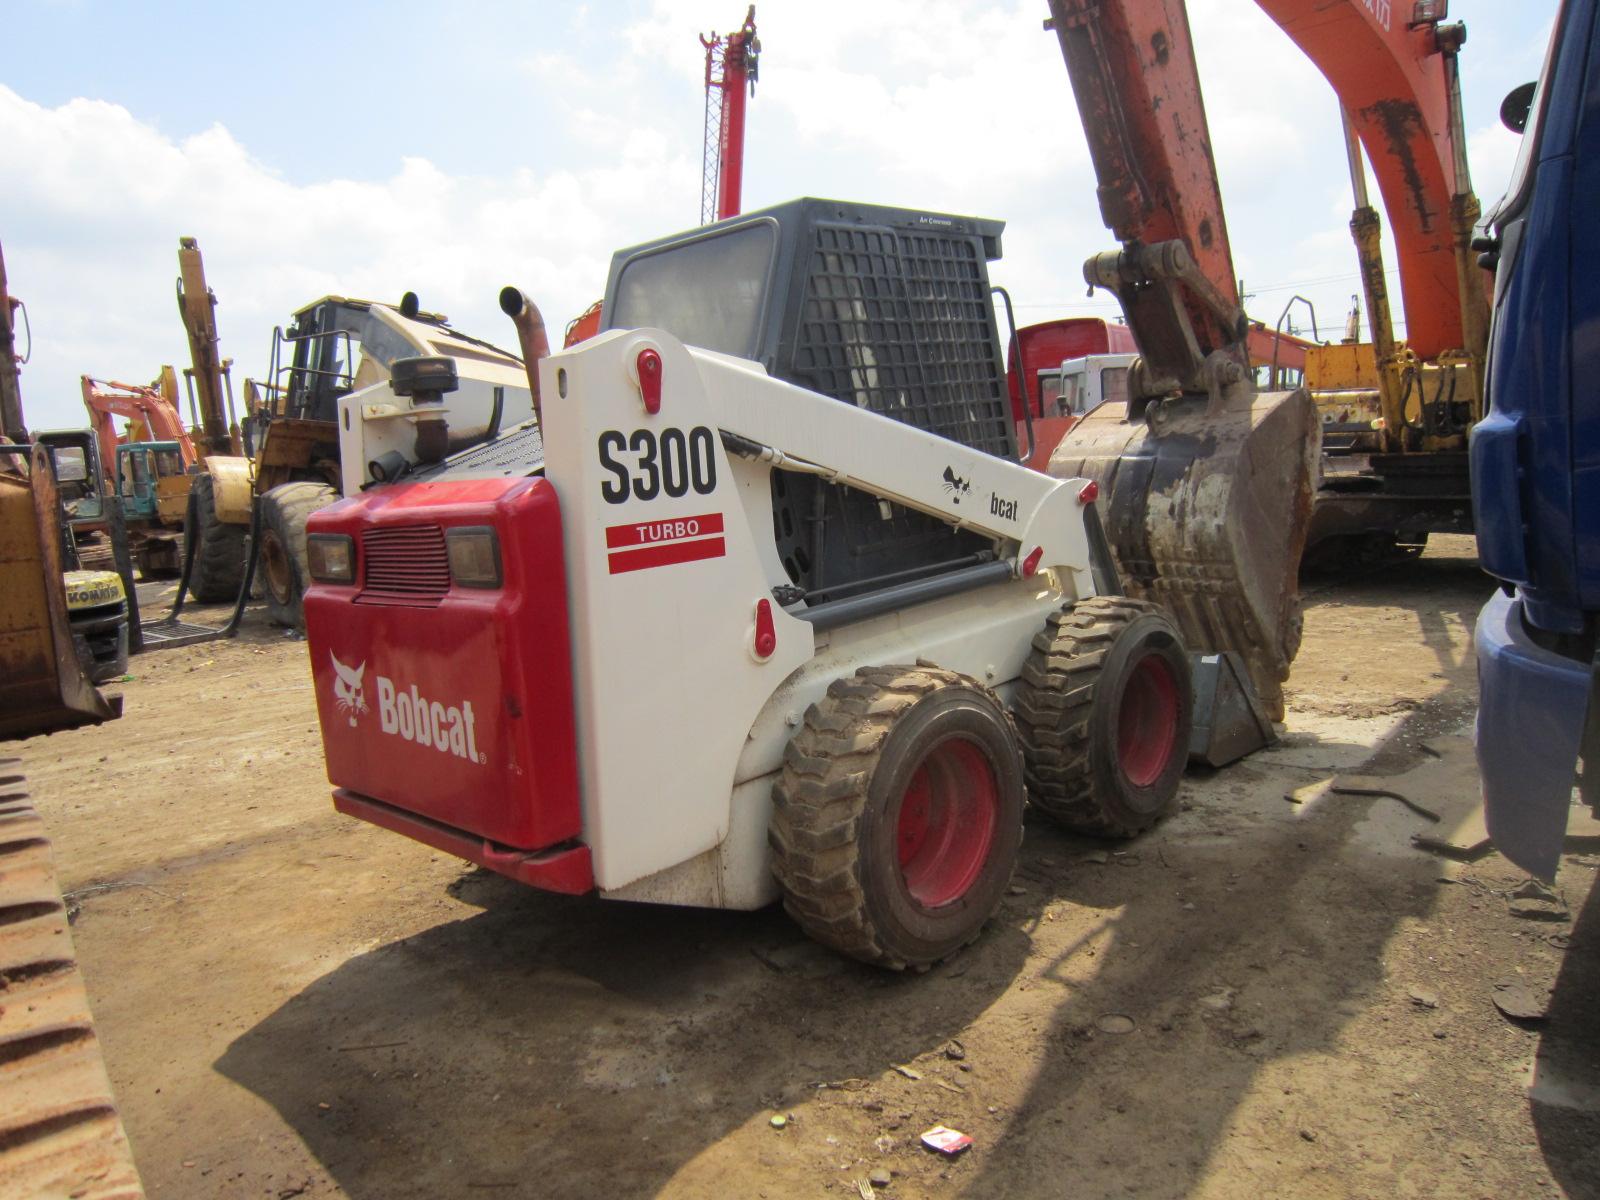 Good quality used Bobcat skid steer loader S300 for sale bobcat loader with low price